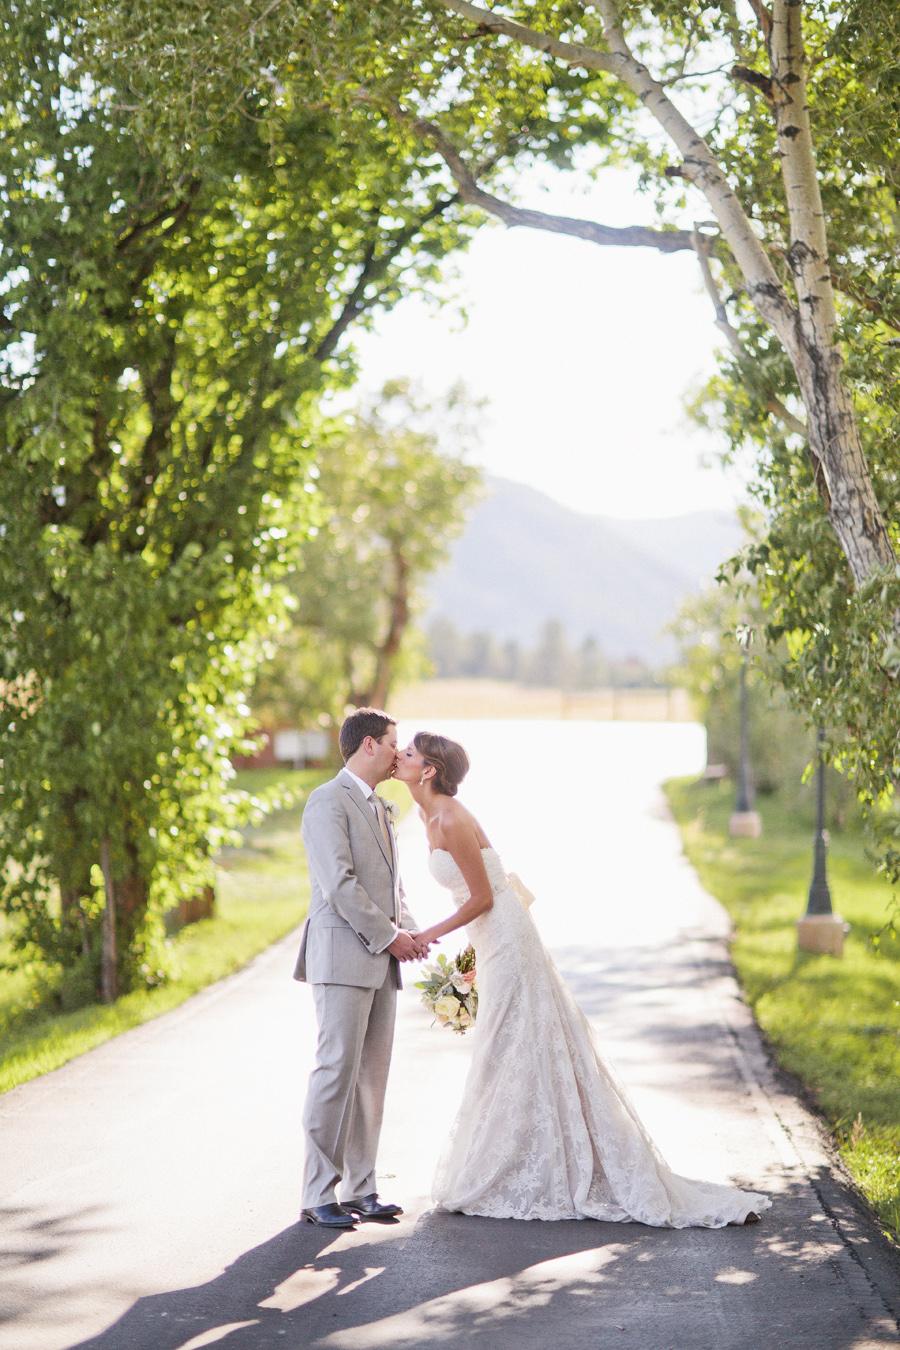 Emily_Todd_LarkspurColorado_Wedding_13.jpg